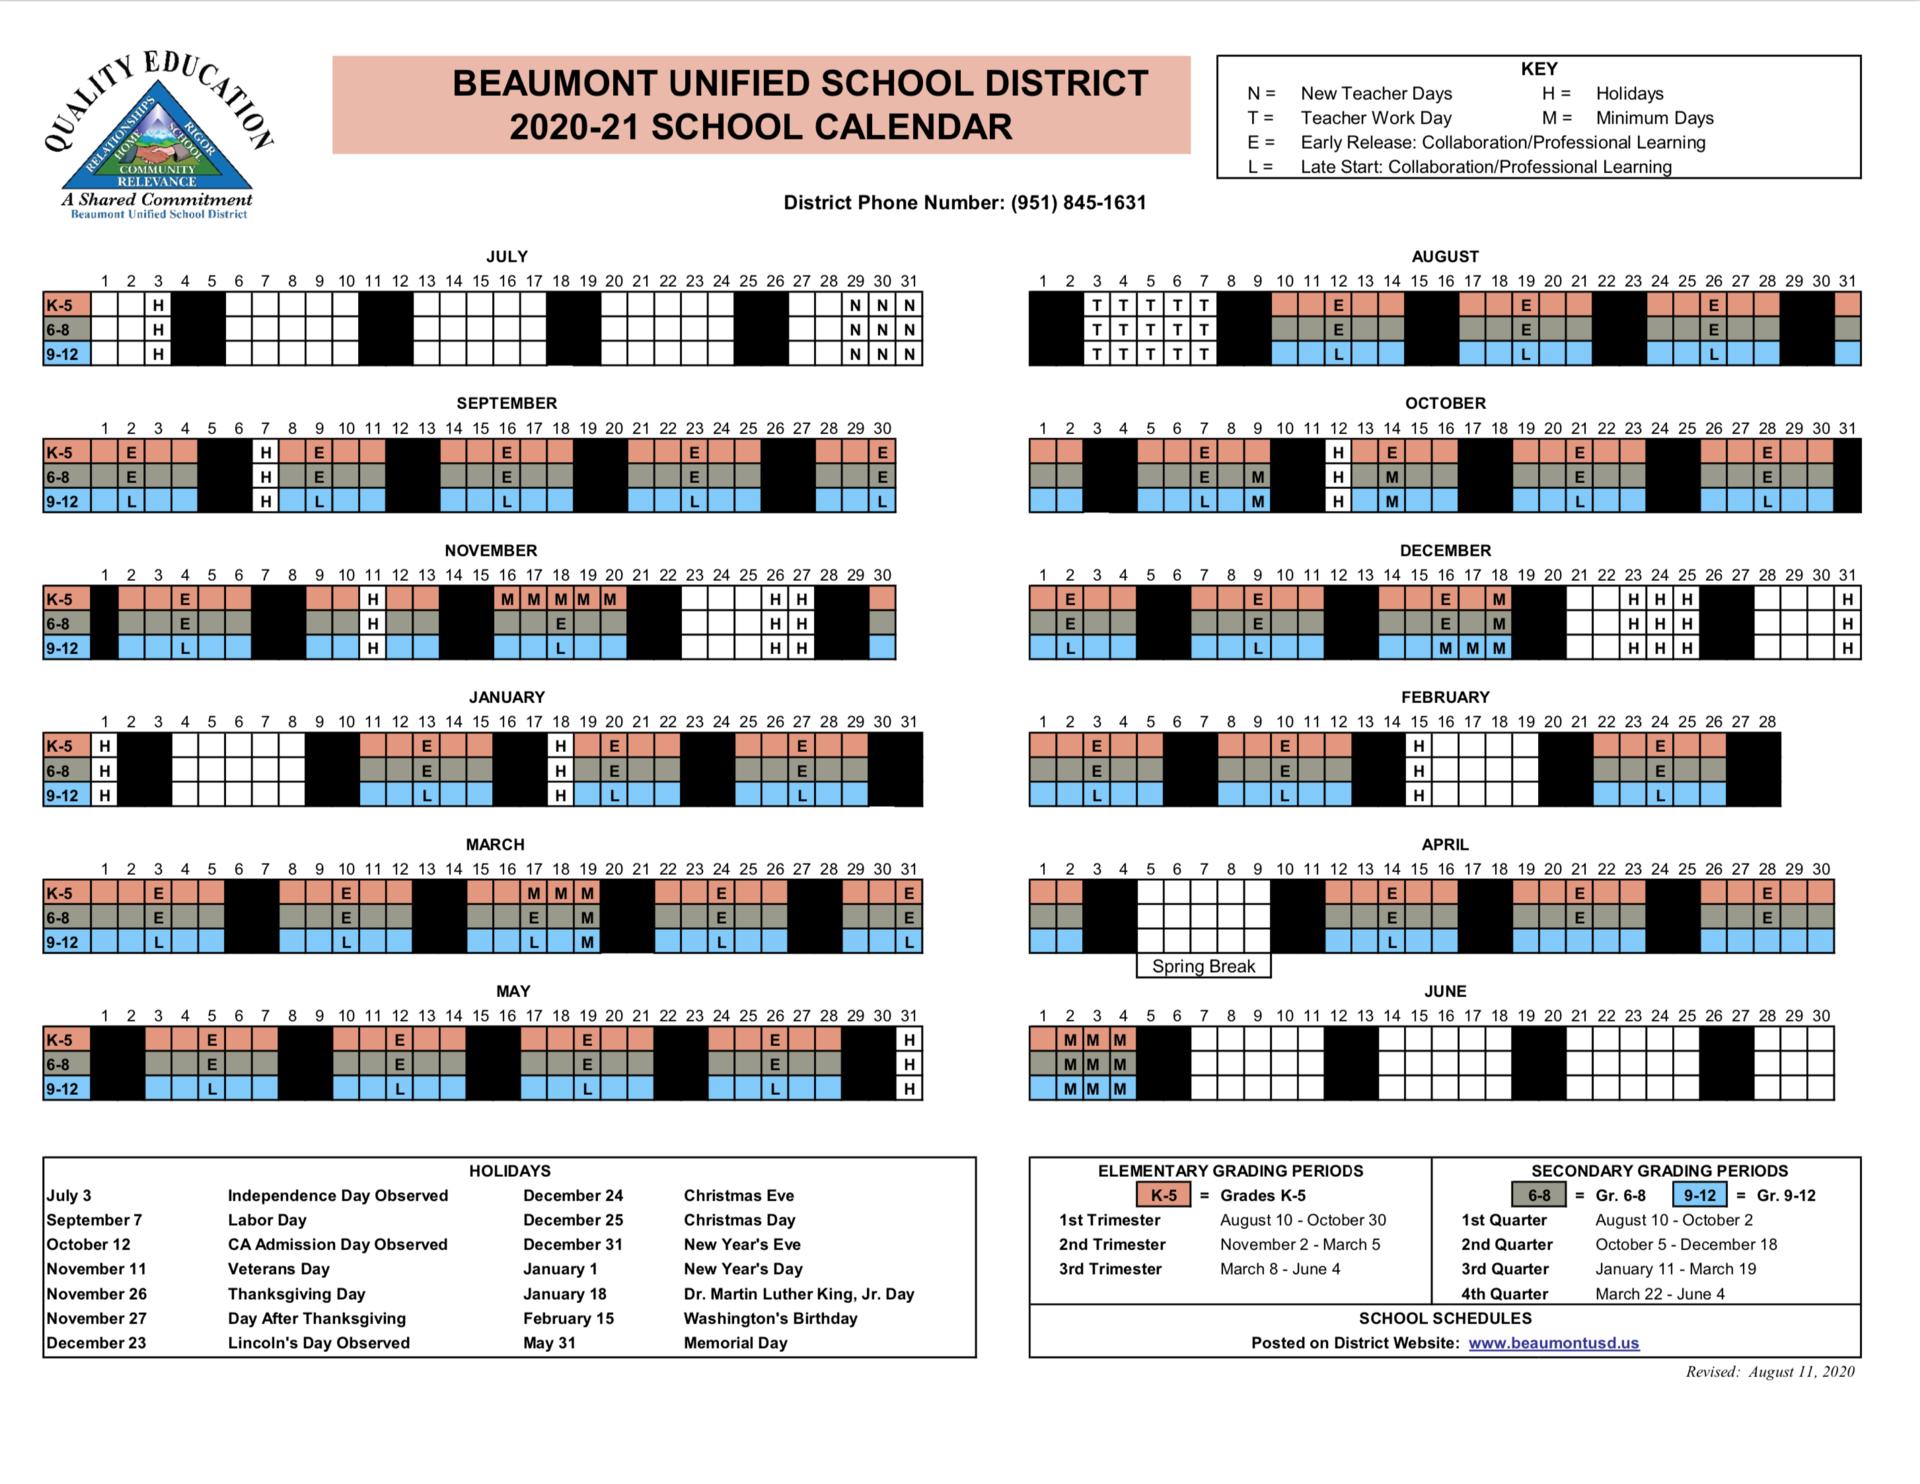 Instructional Calendar 2020-21 School Year